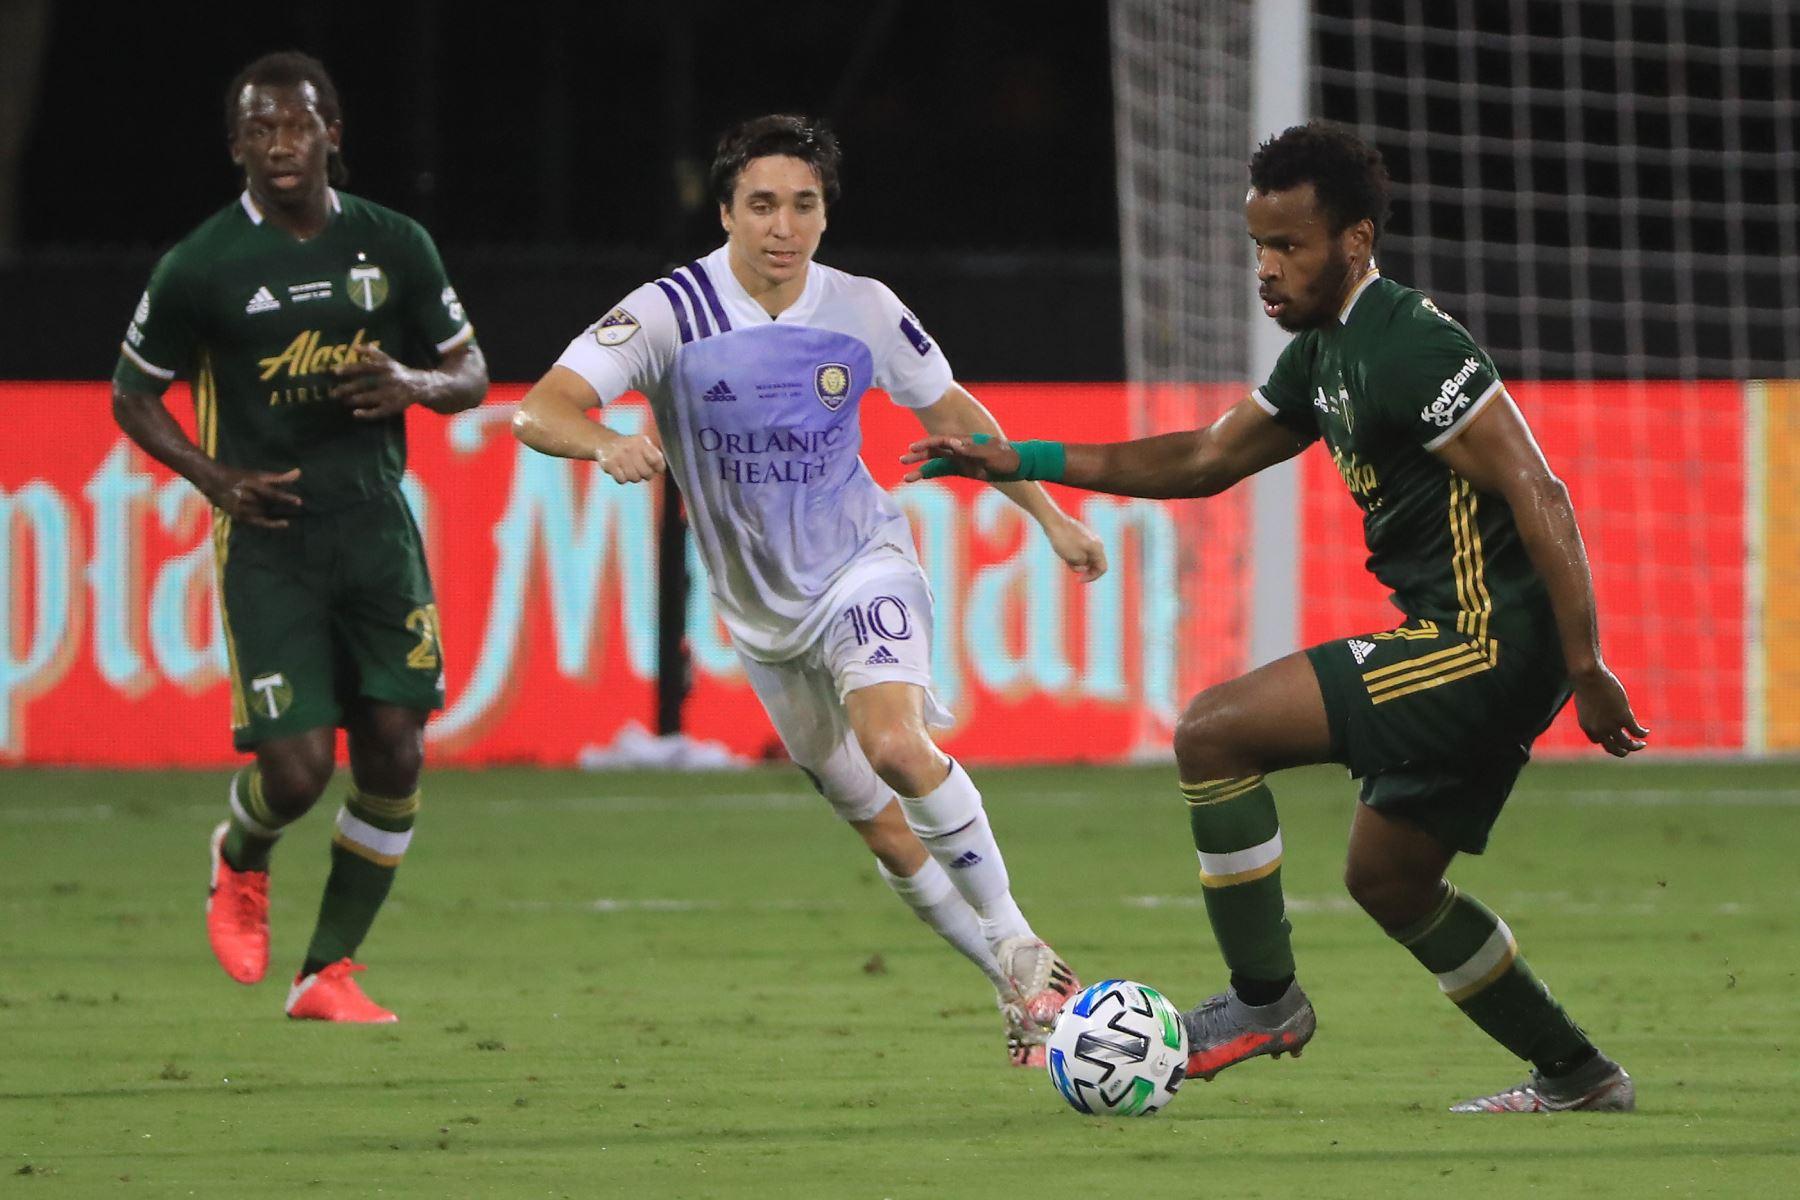 Orlando City disputa el partido final del Torneo MLS Is Back contra Portland Timbers. Foto: ANDINA/AFP